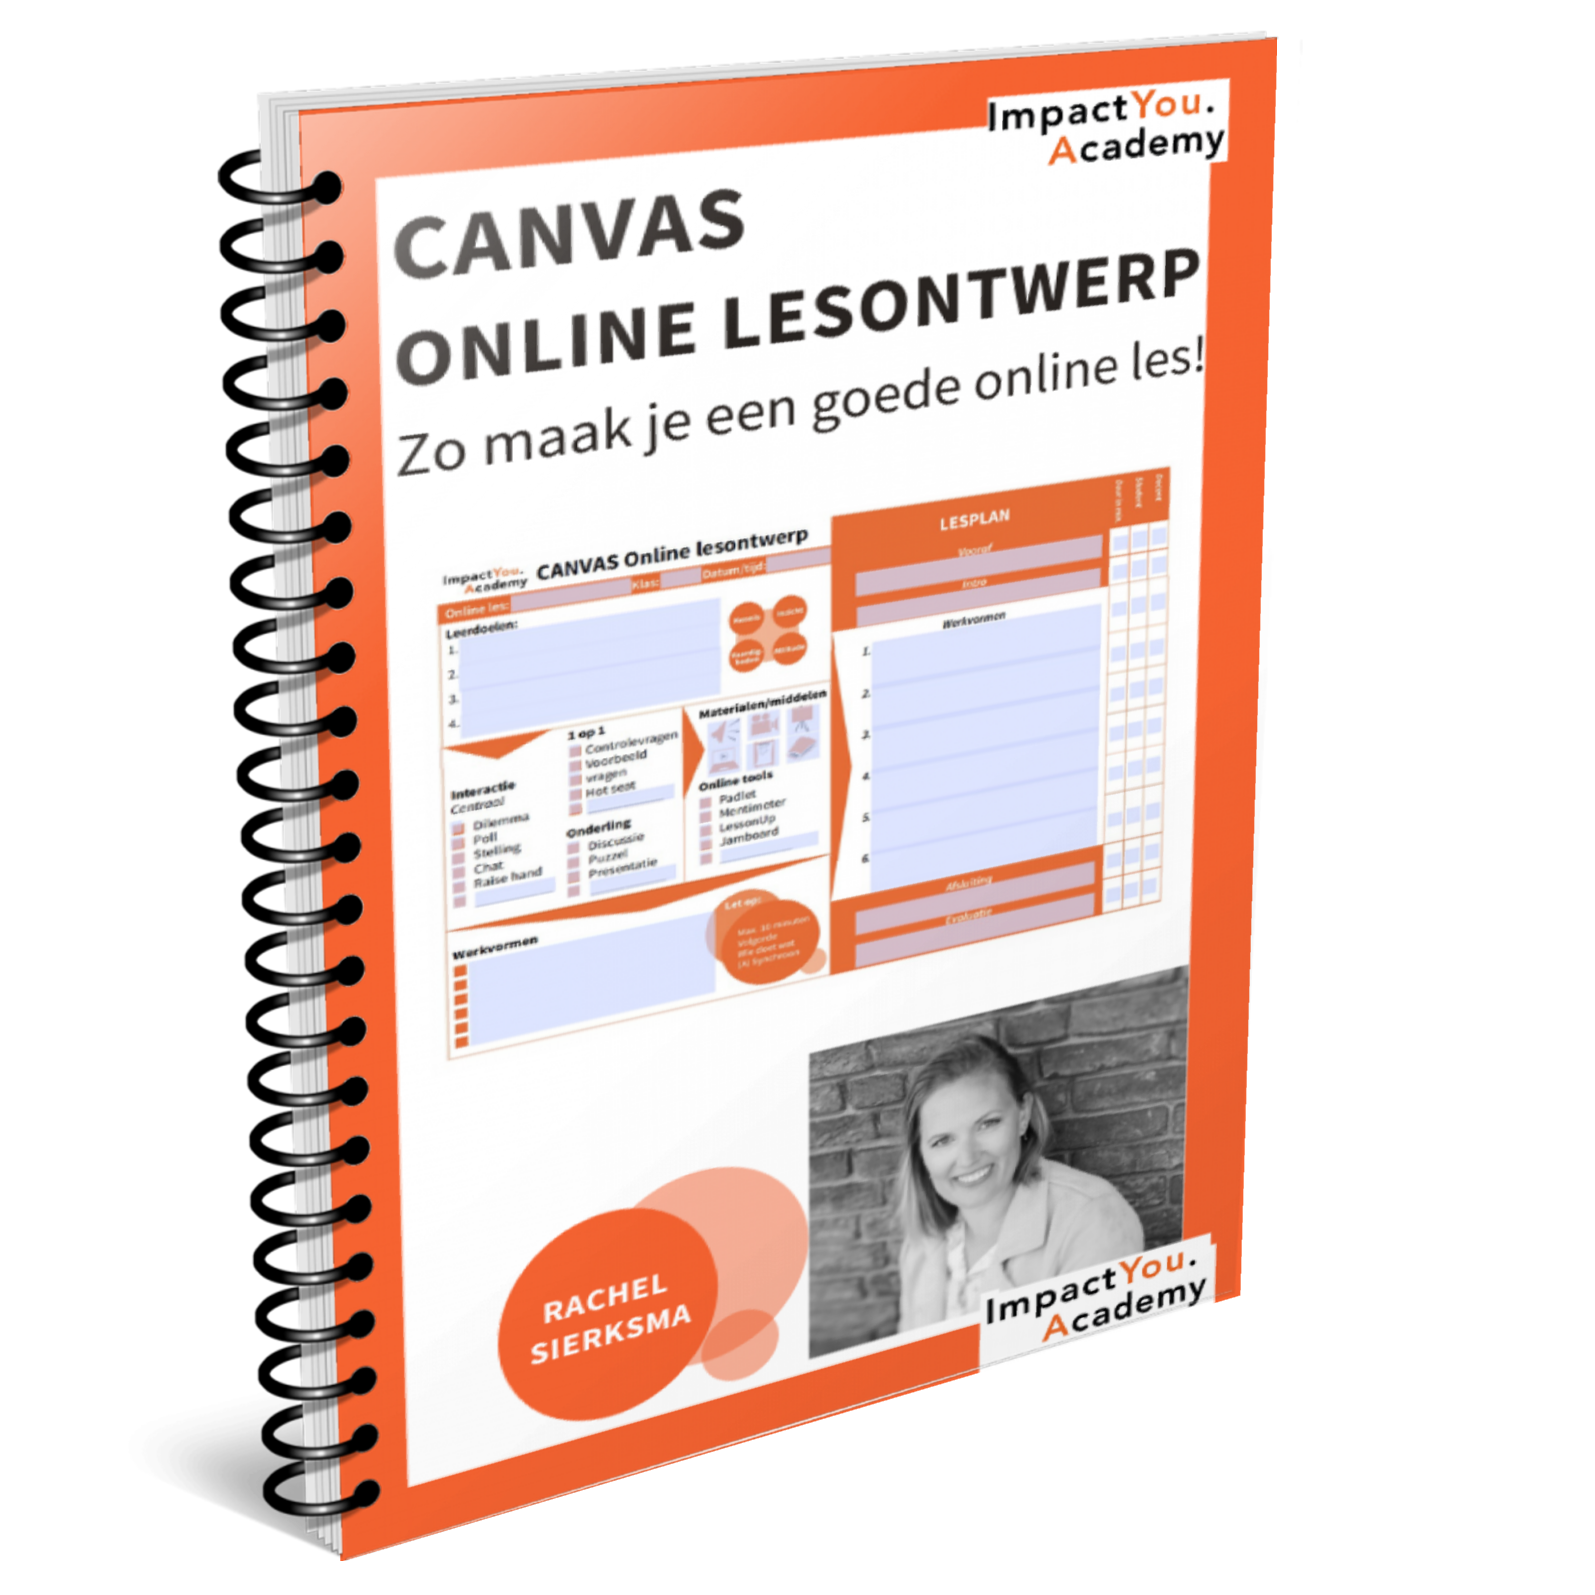 canvas online lesontwerp